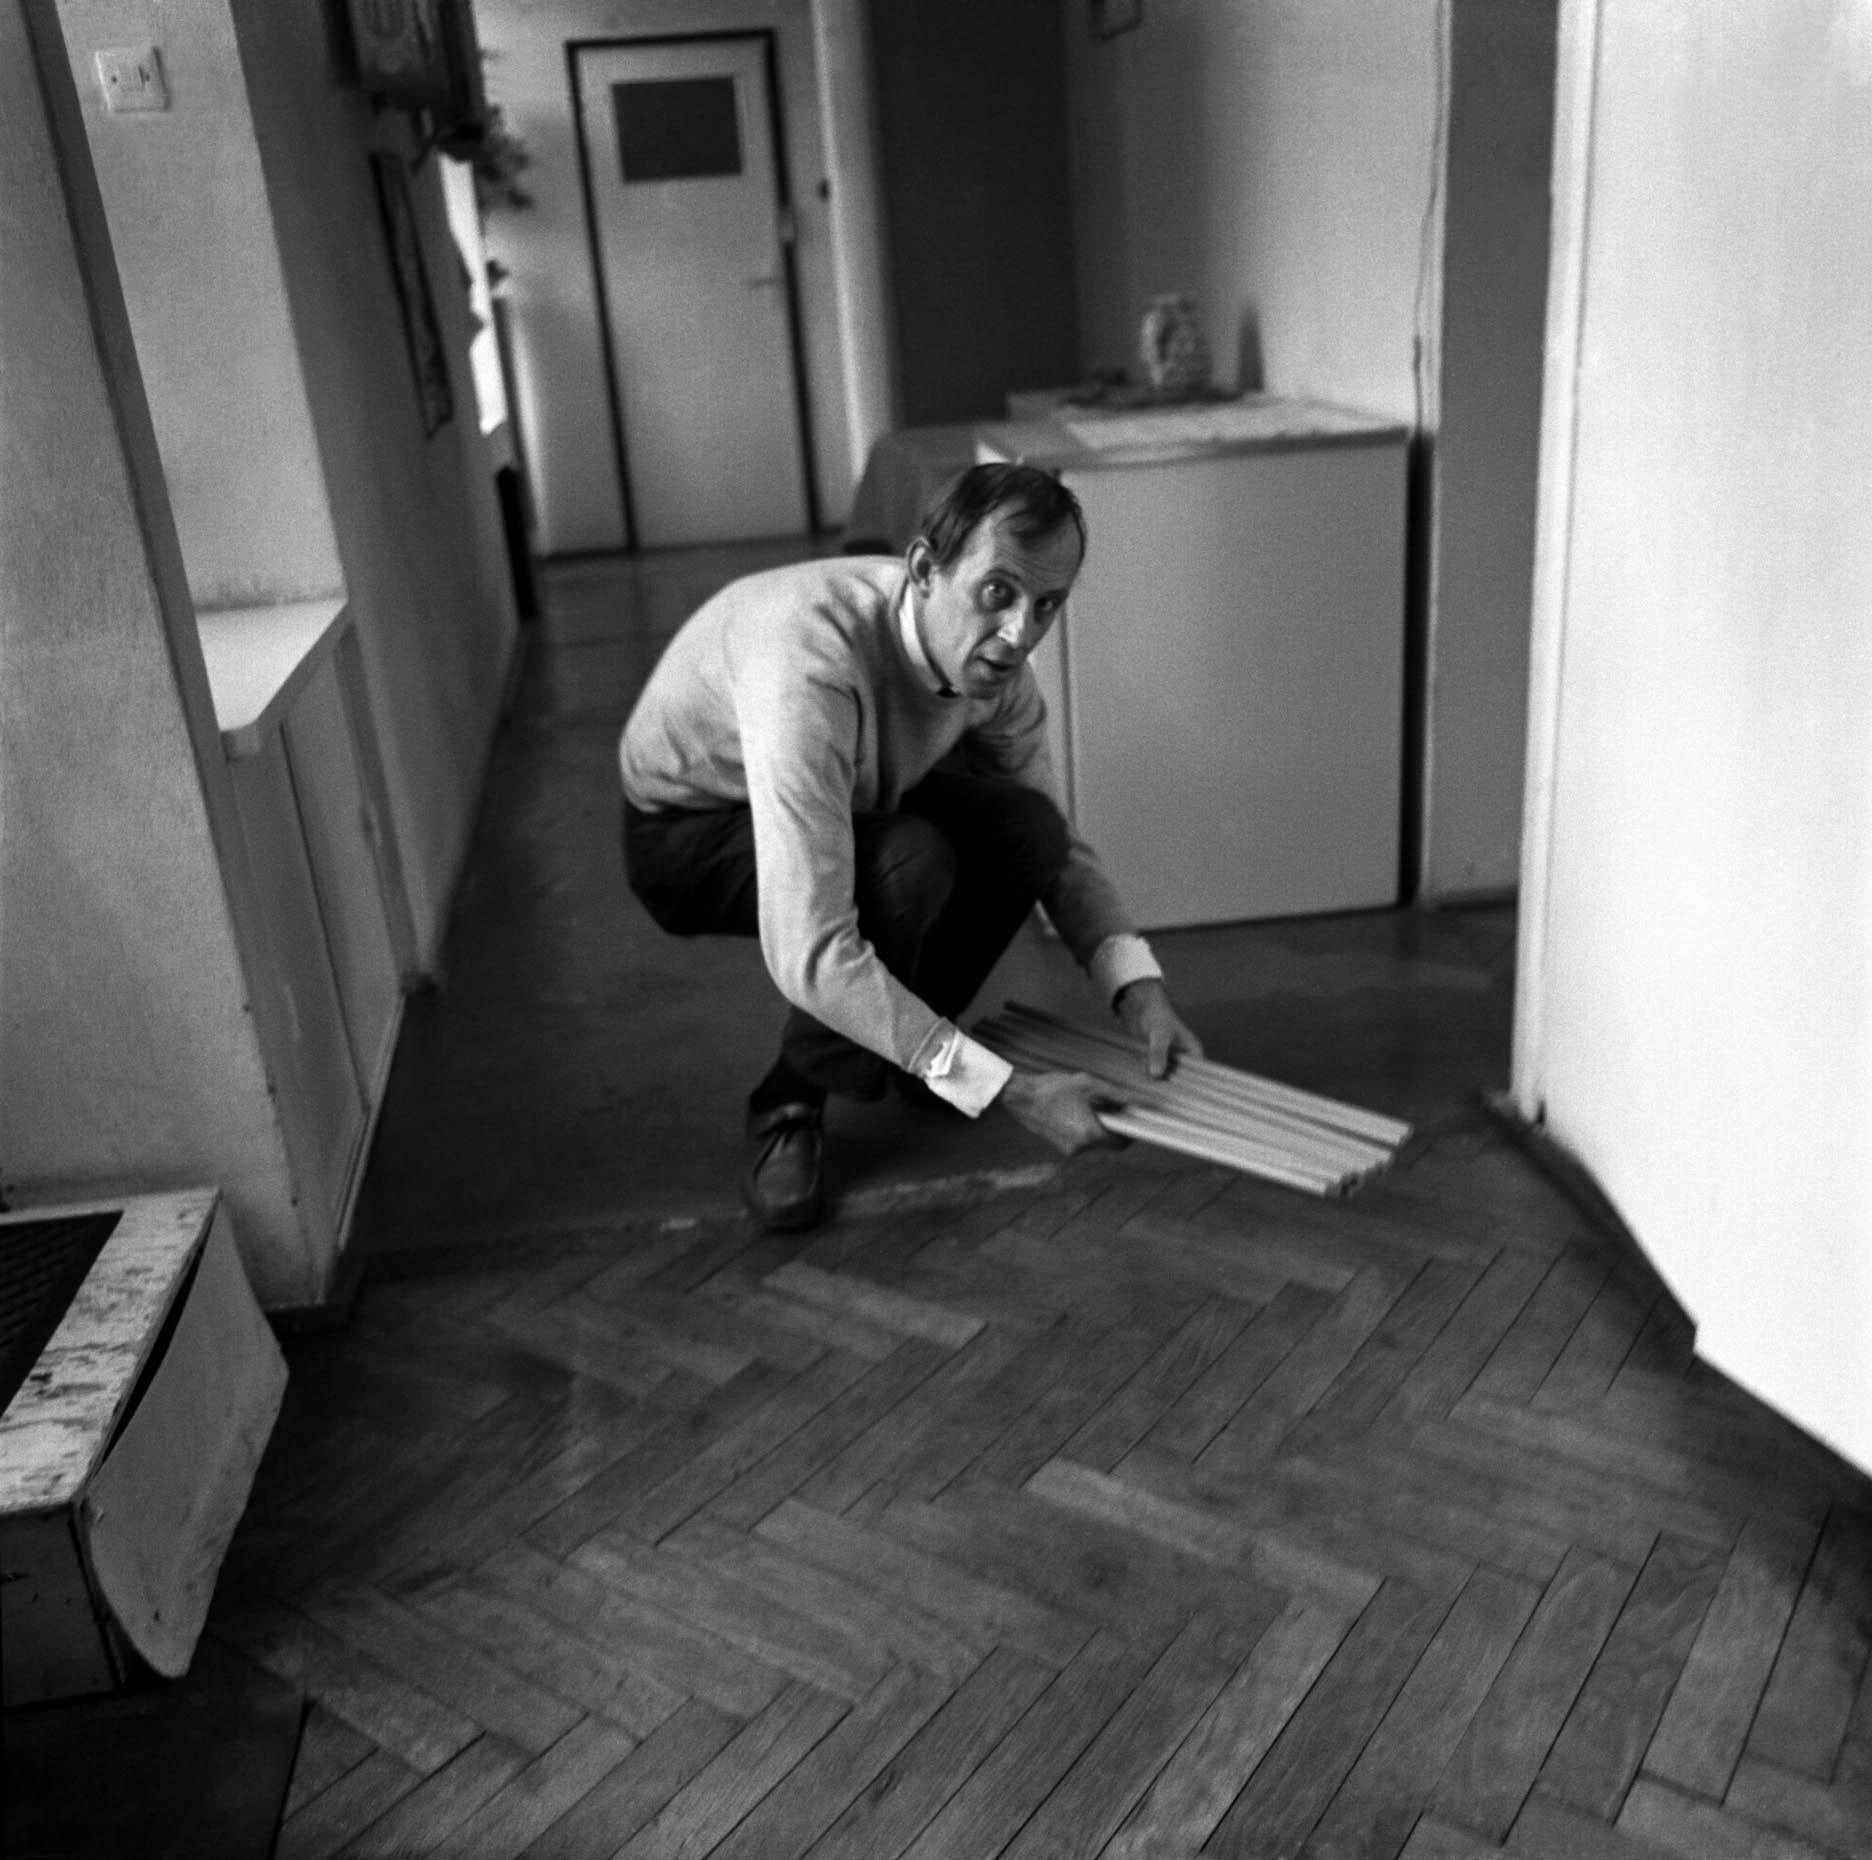 Photo by Eustachy Kossakowski ©Hanna Ptaszkowska and archive of Museum of Modern Art Warsaw  (Edward Krasiński 3)